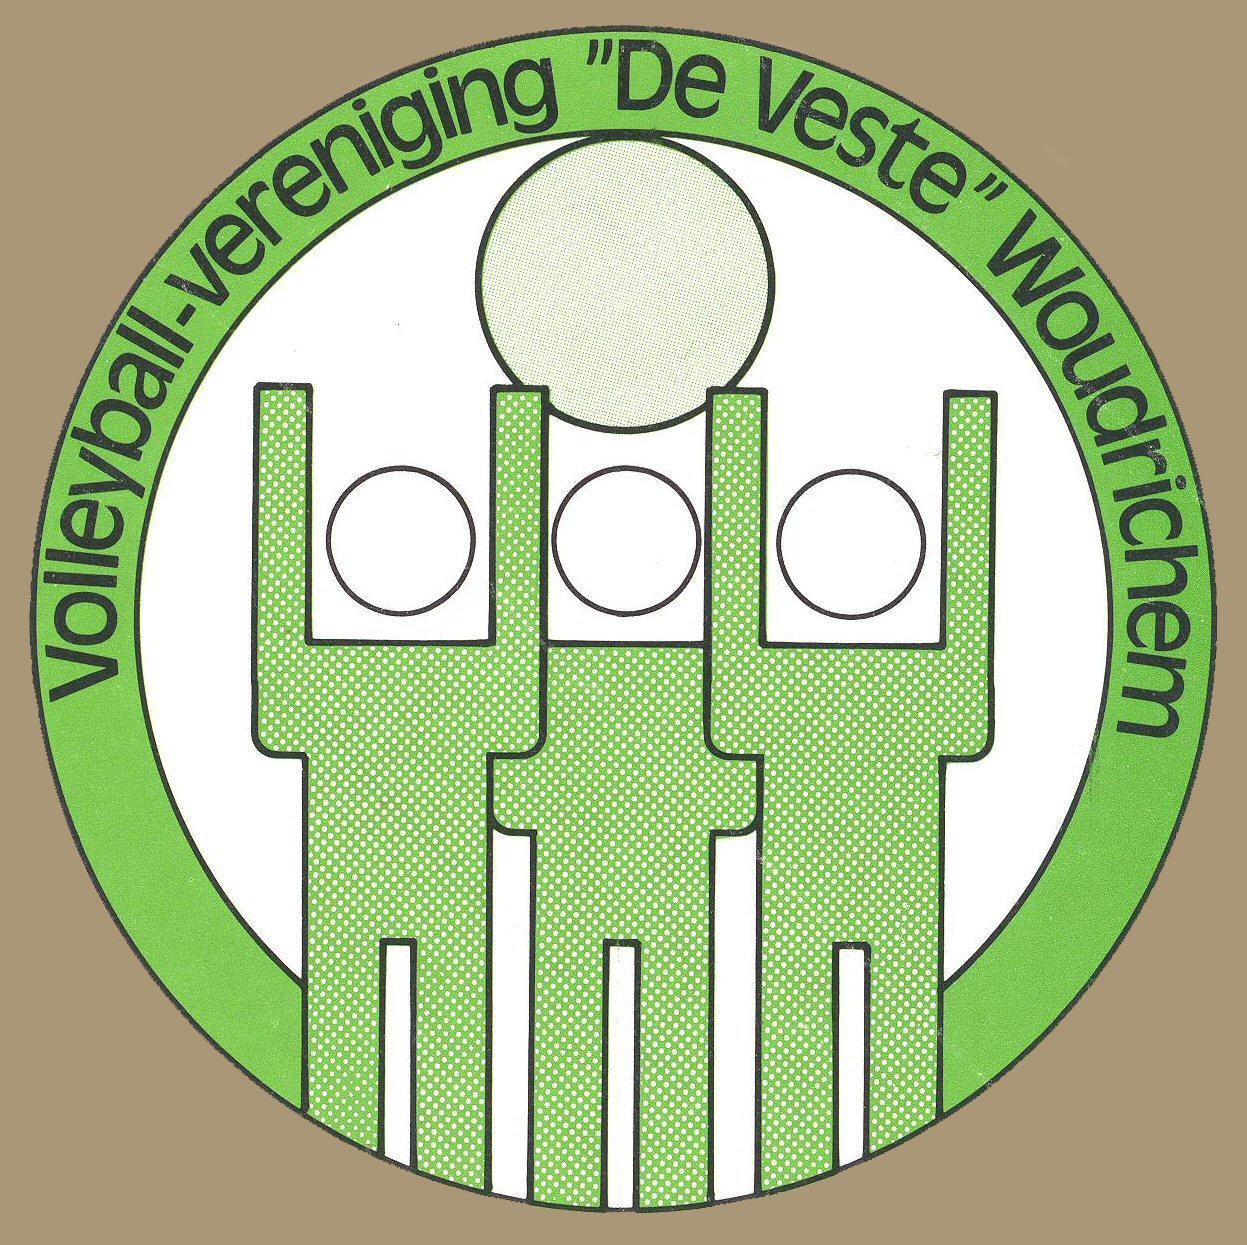 STICK-021 Volleyball-vereniging De Veste